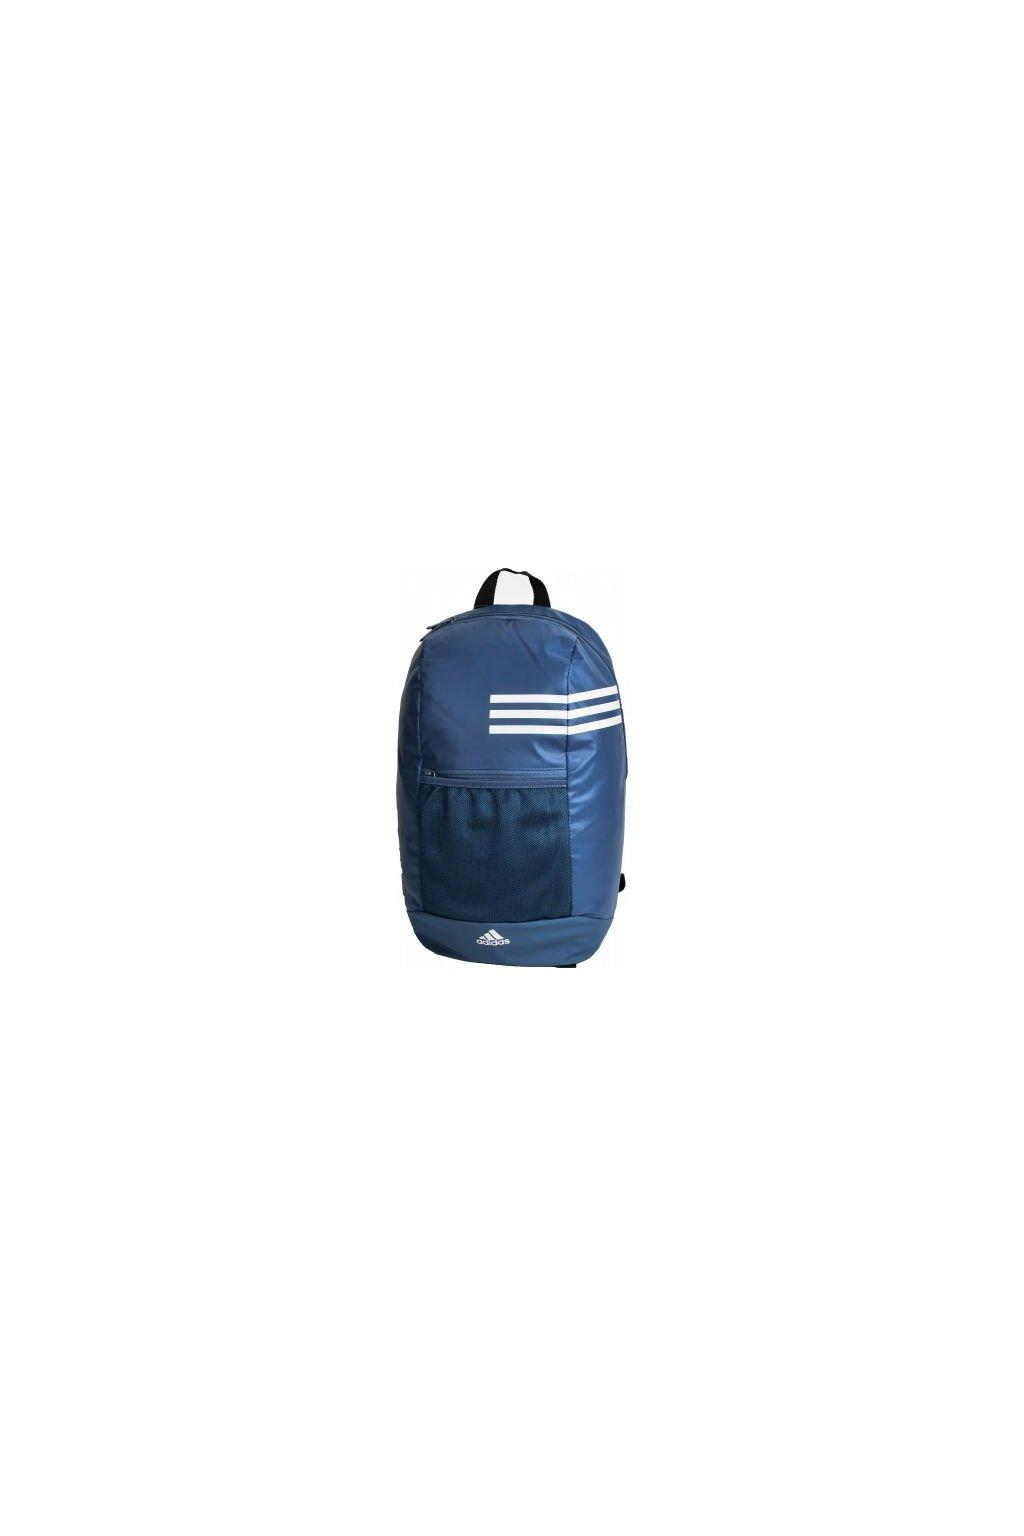 Batoh Adidas Climacool TD M modrý S18193